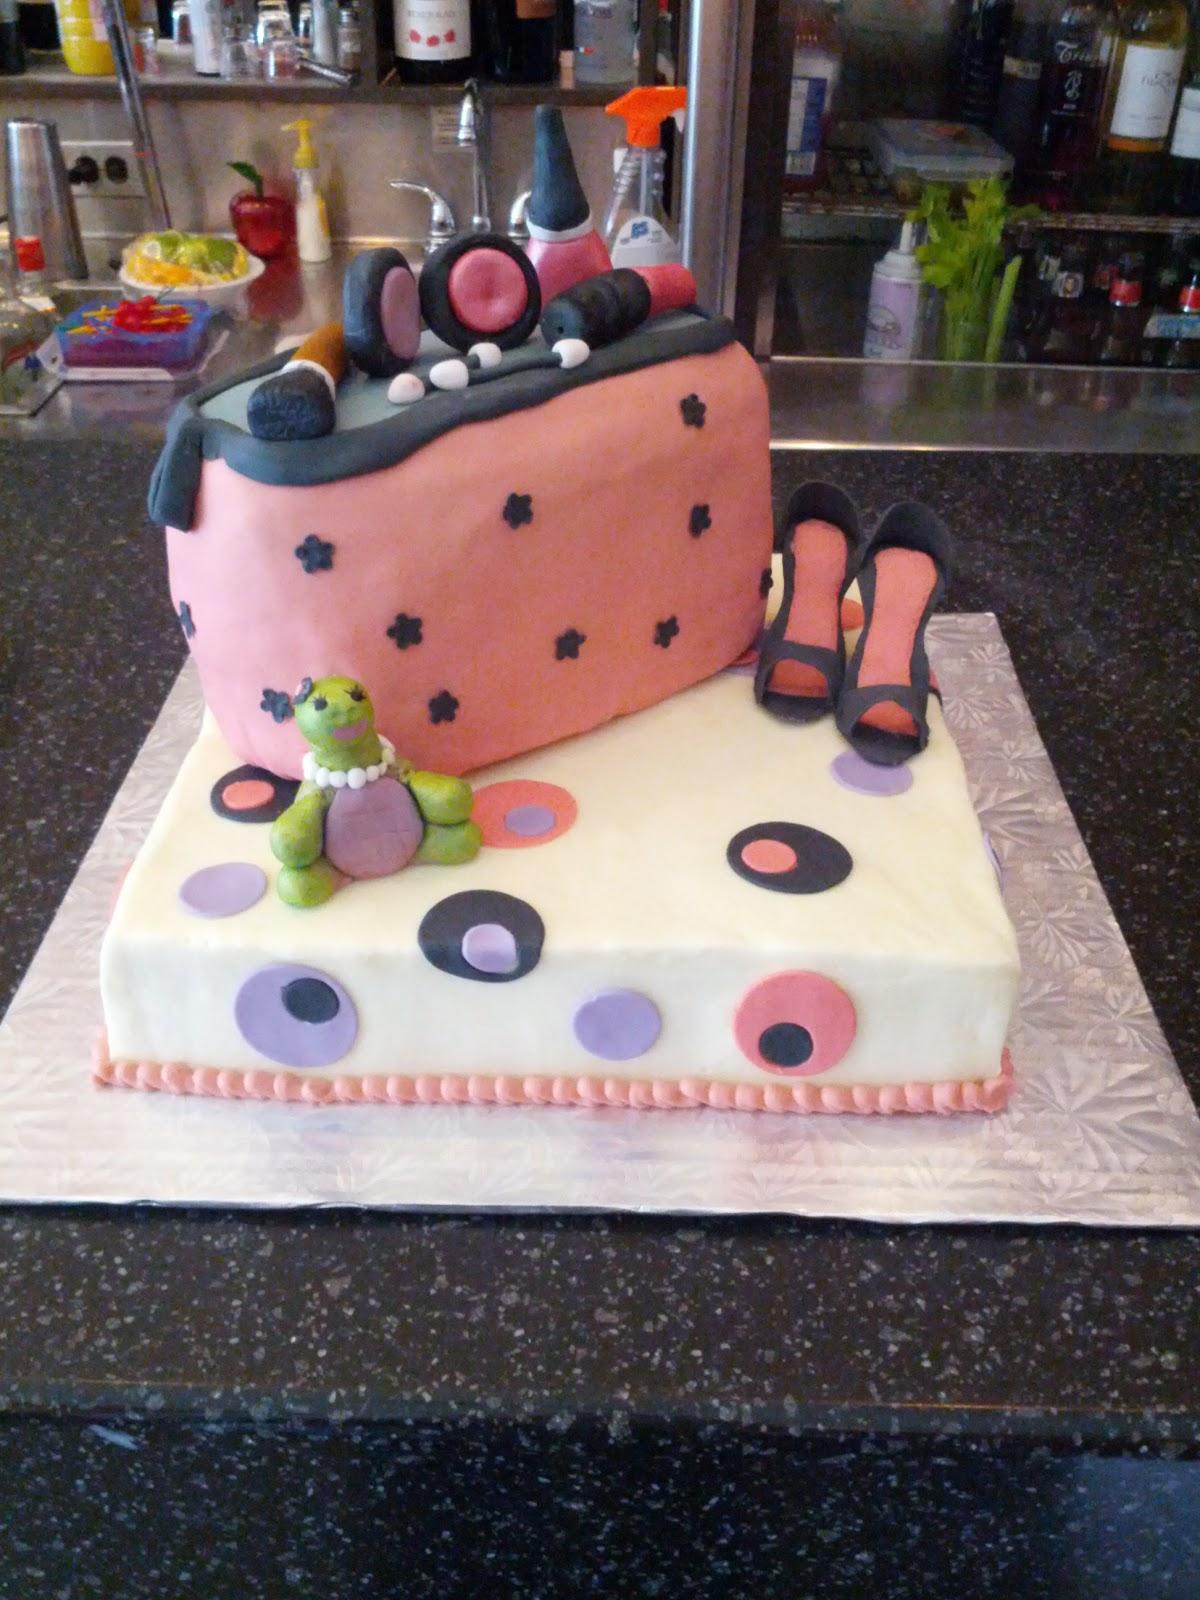 Second Generation Cake Design Divine Diva Cake